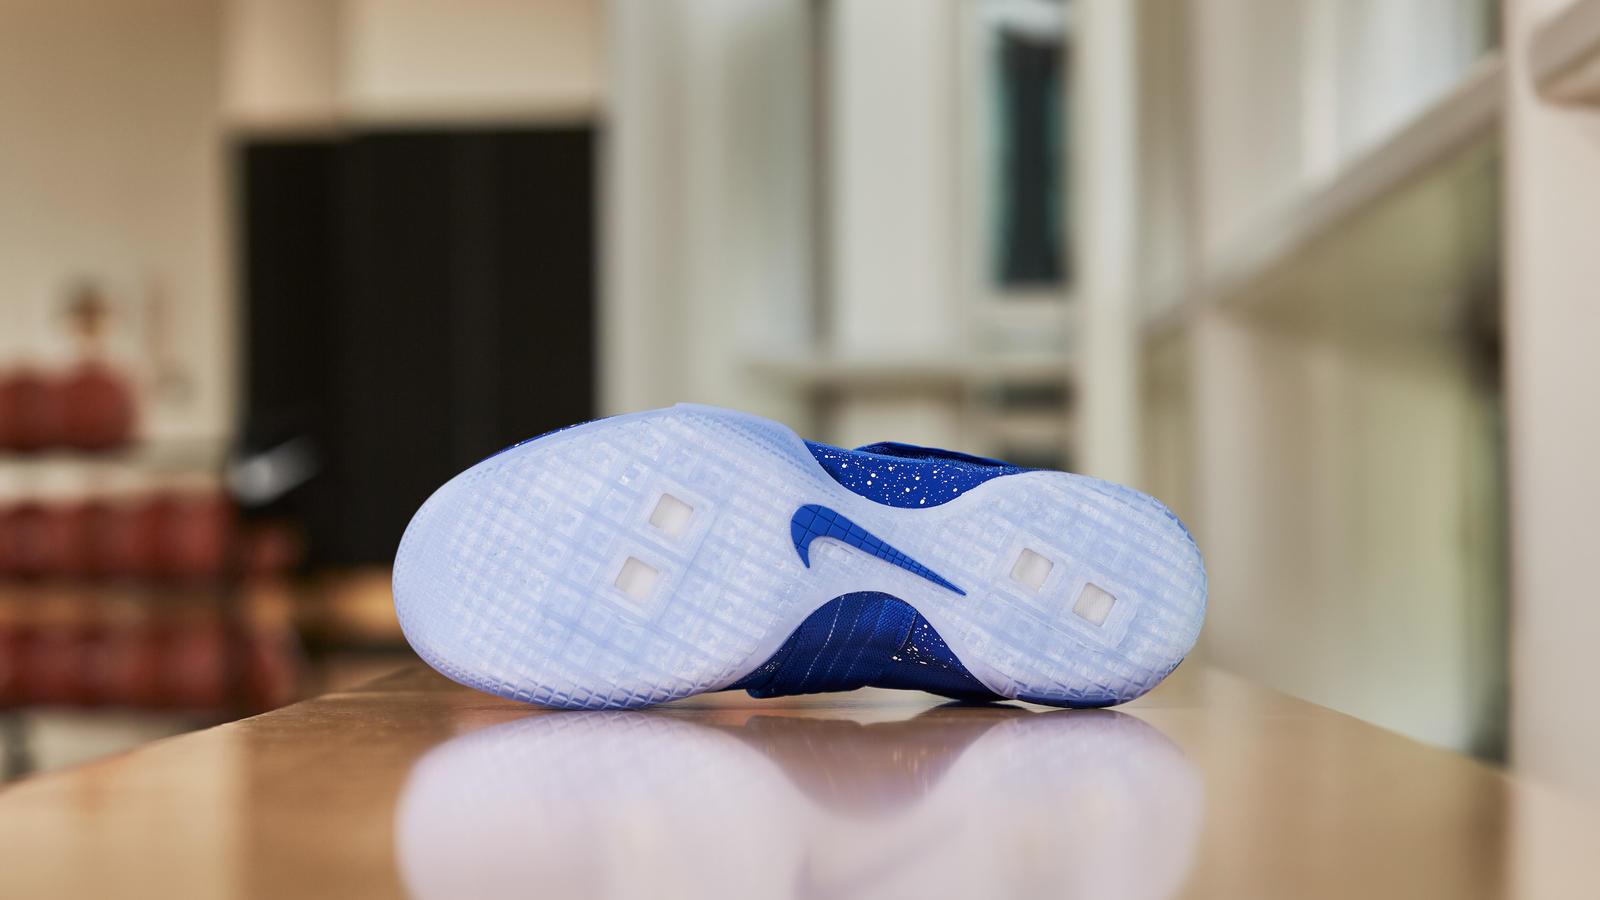 Nike Zoom LeBron Soldier 10 PE